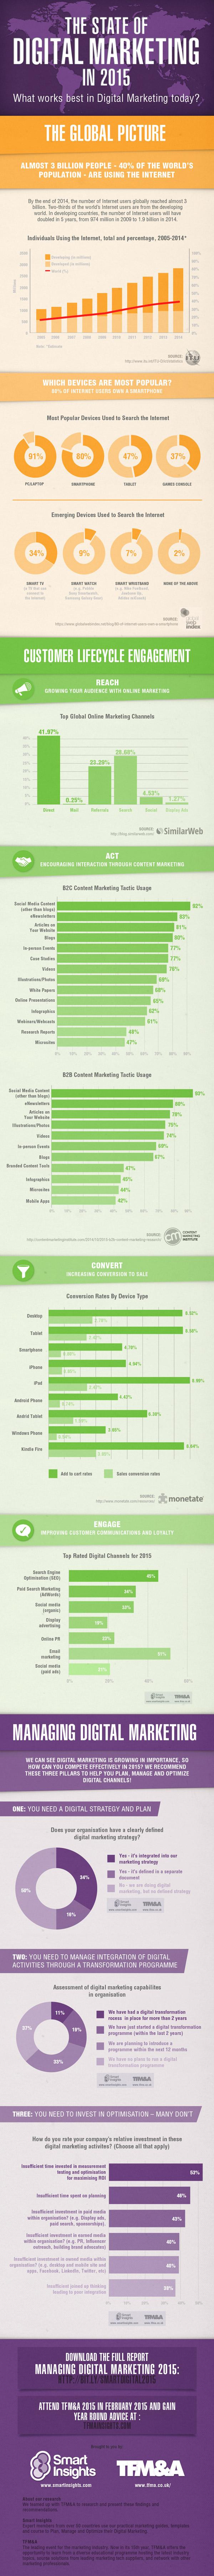 digital marketing insights infographic